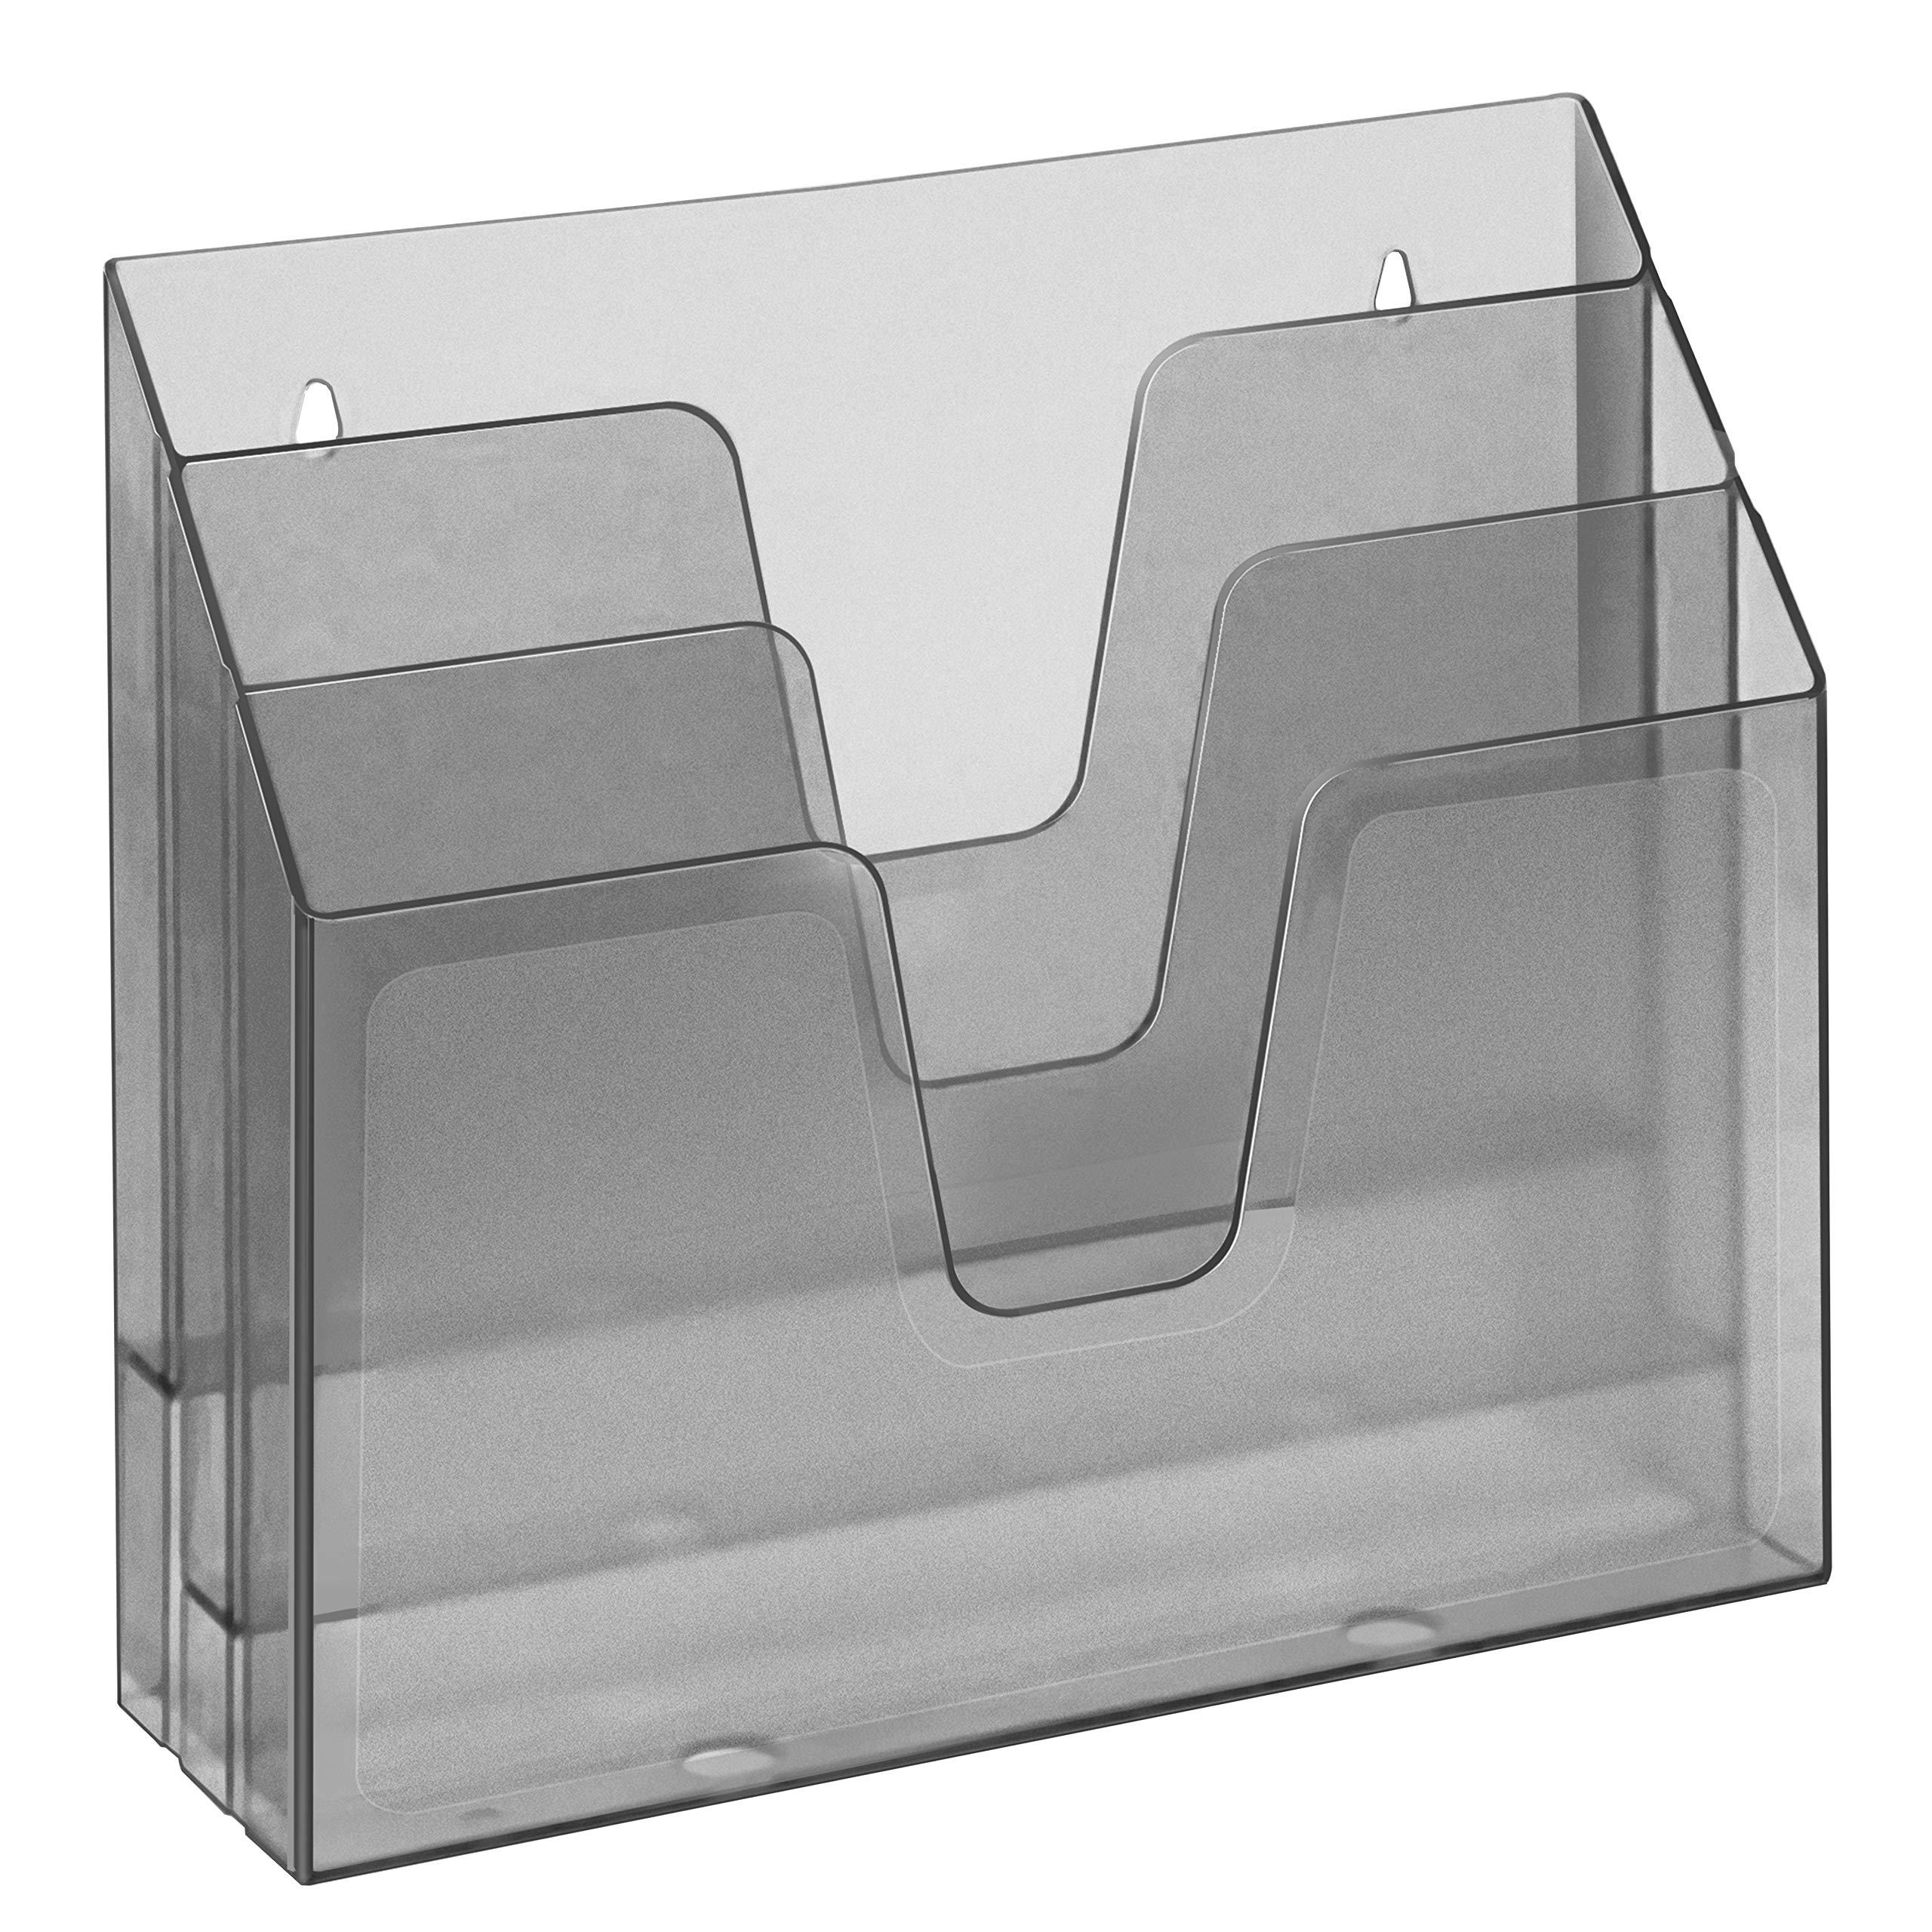 Acrimet Horizontal Triple File Folder Organizer (Smoke Color)